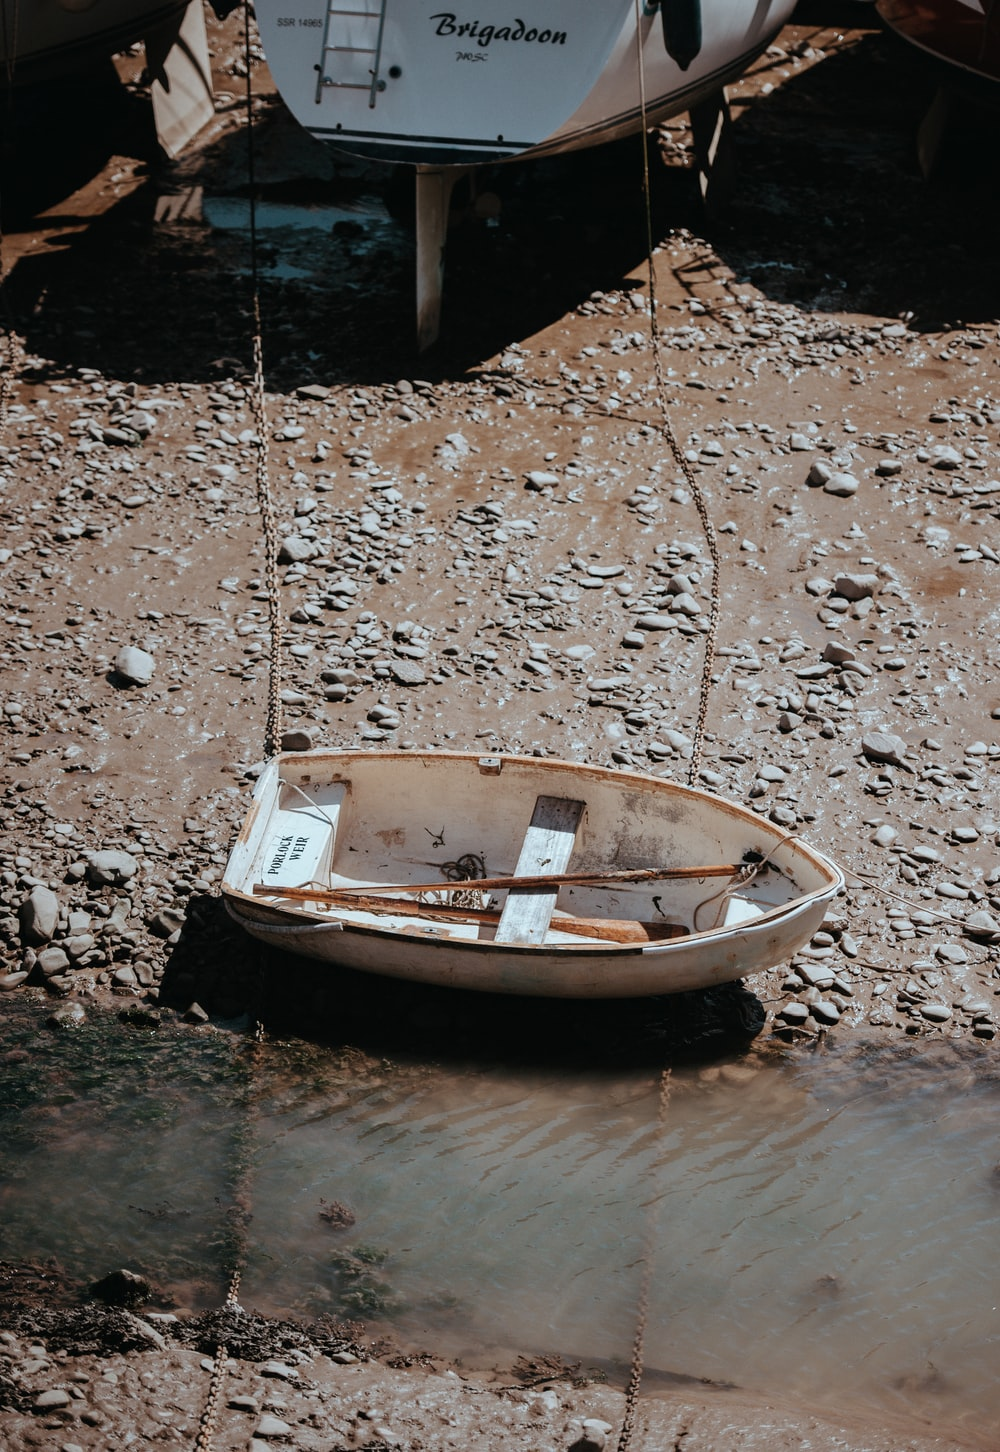 white jon boat on seashore